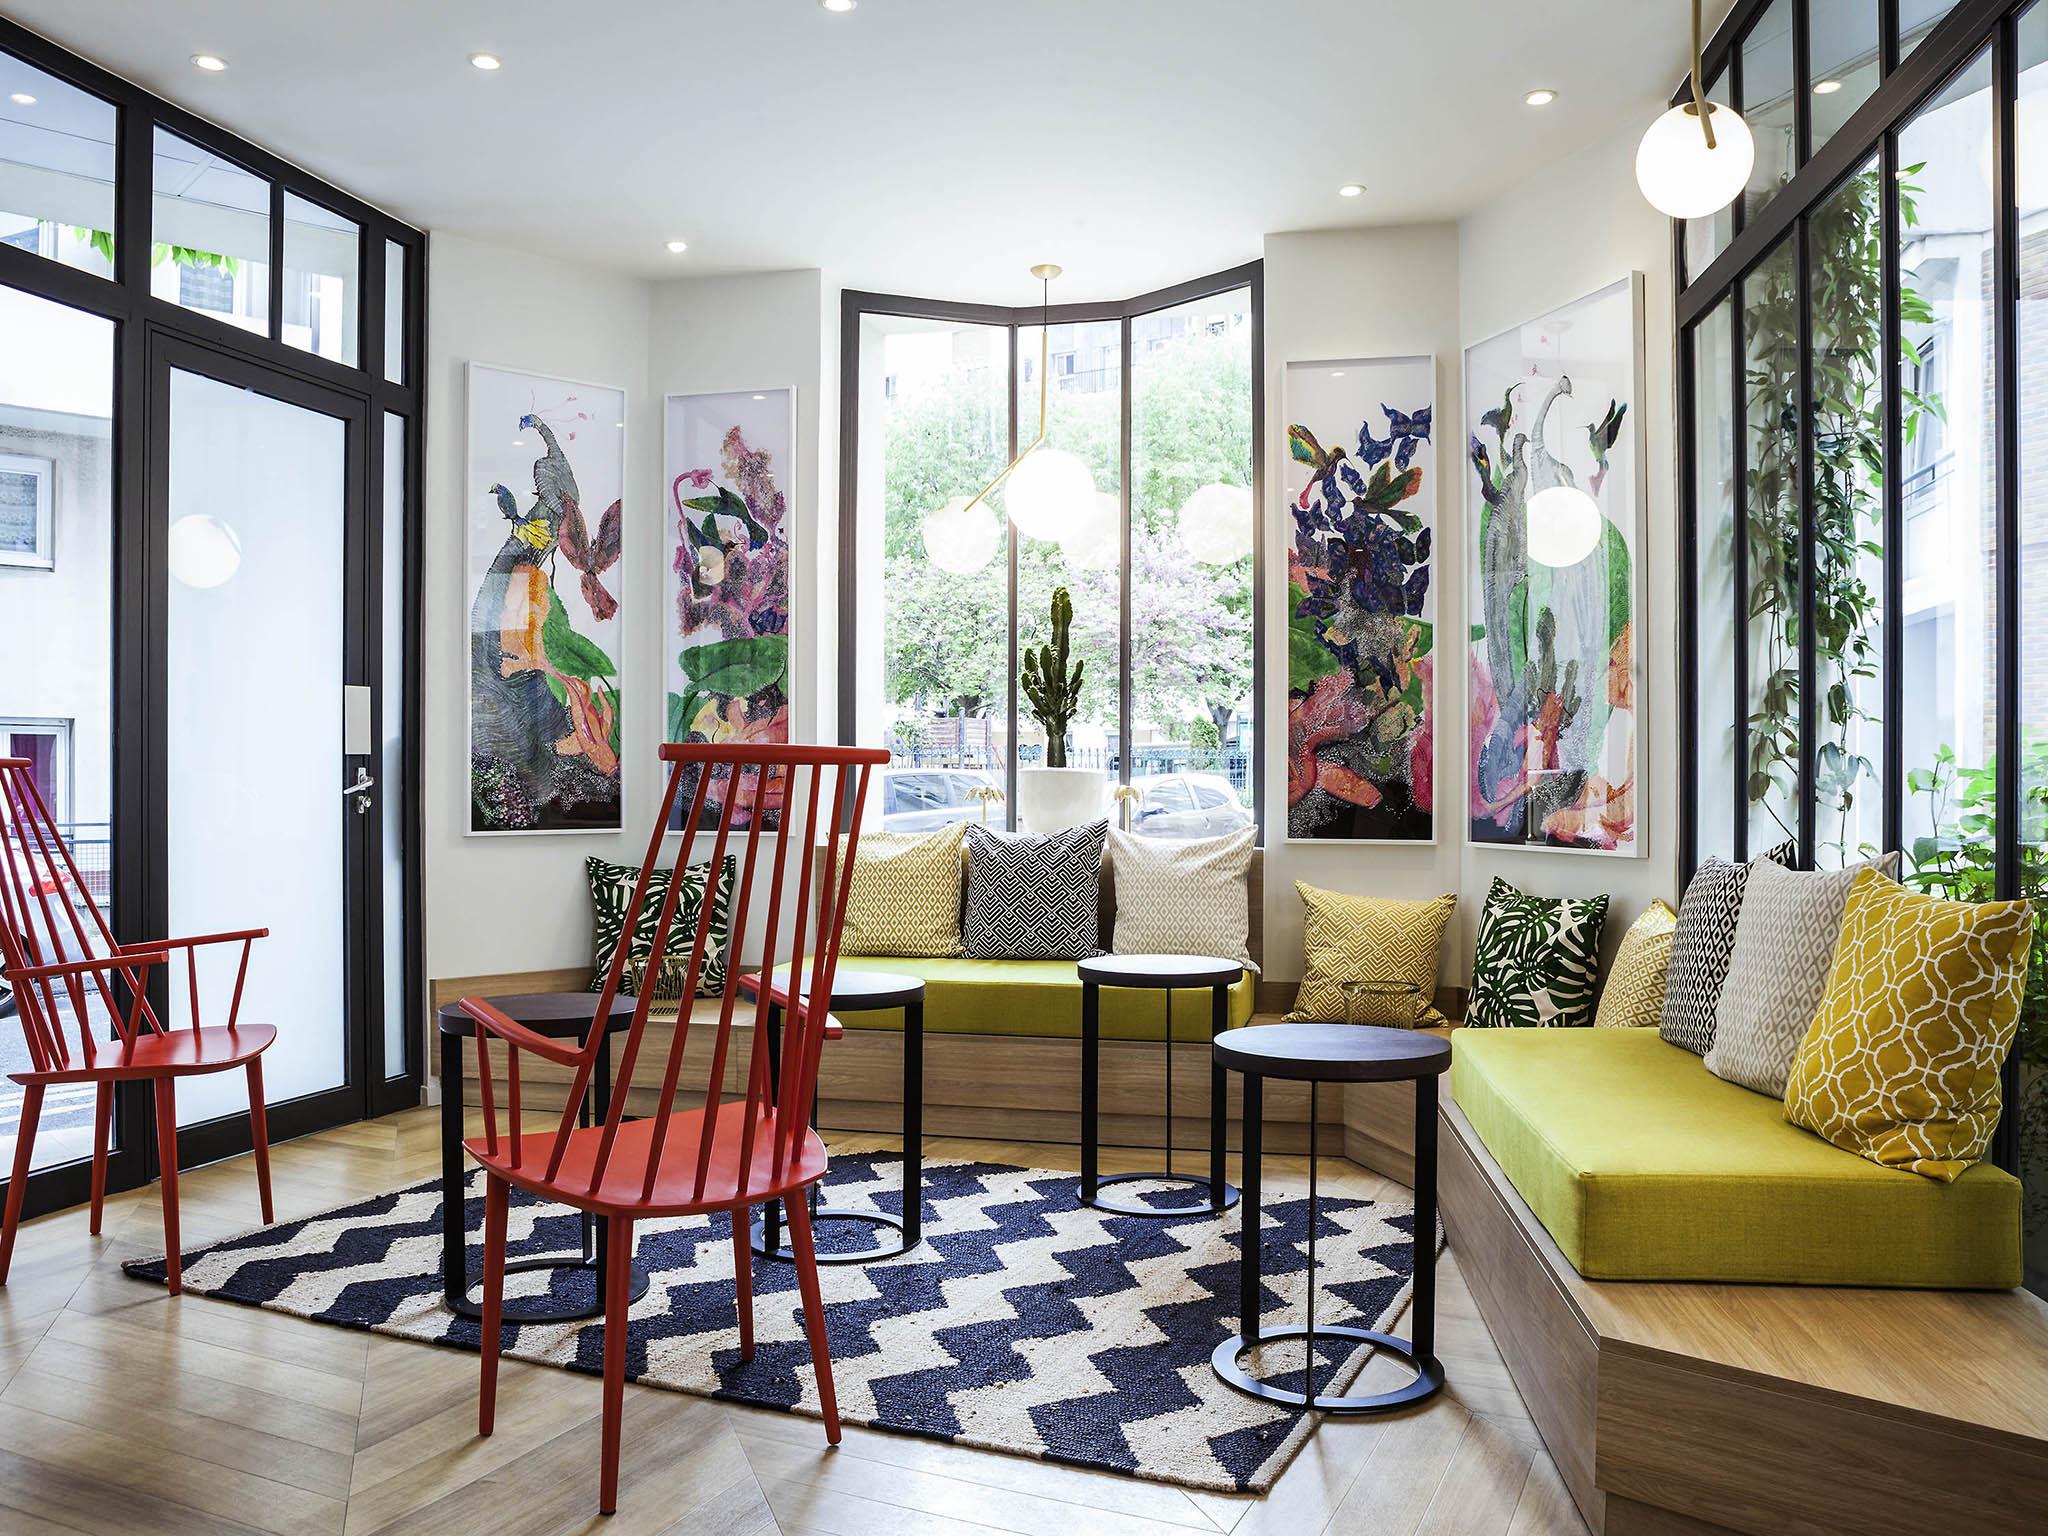 فندق - فندق إيبيس ستايلز ibis Styles باريس ناسيون بورت دي مونتروي